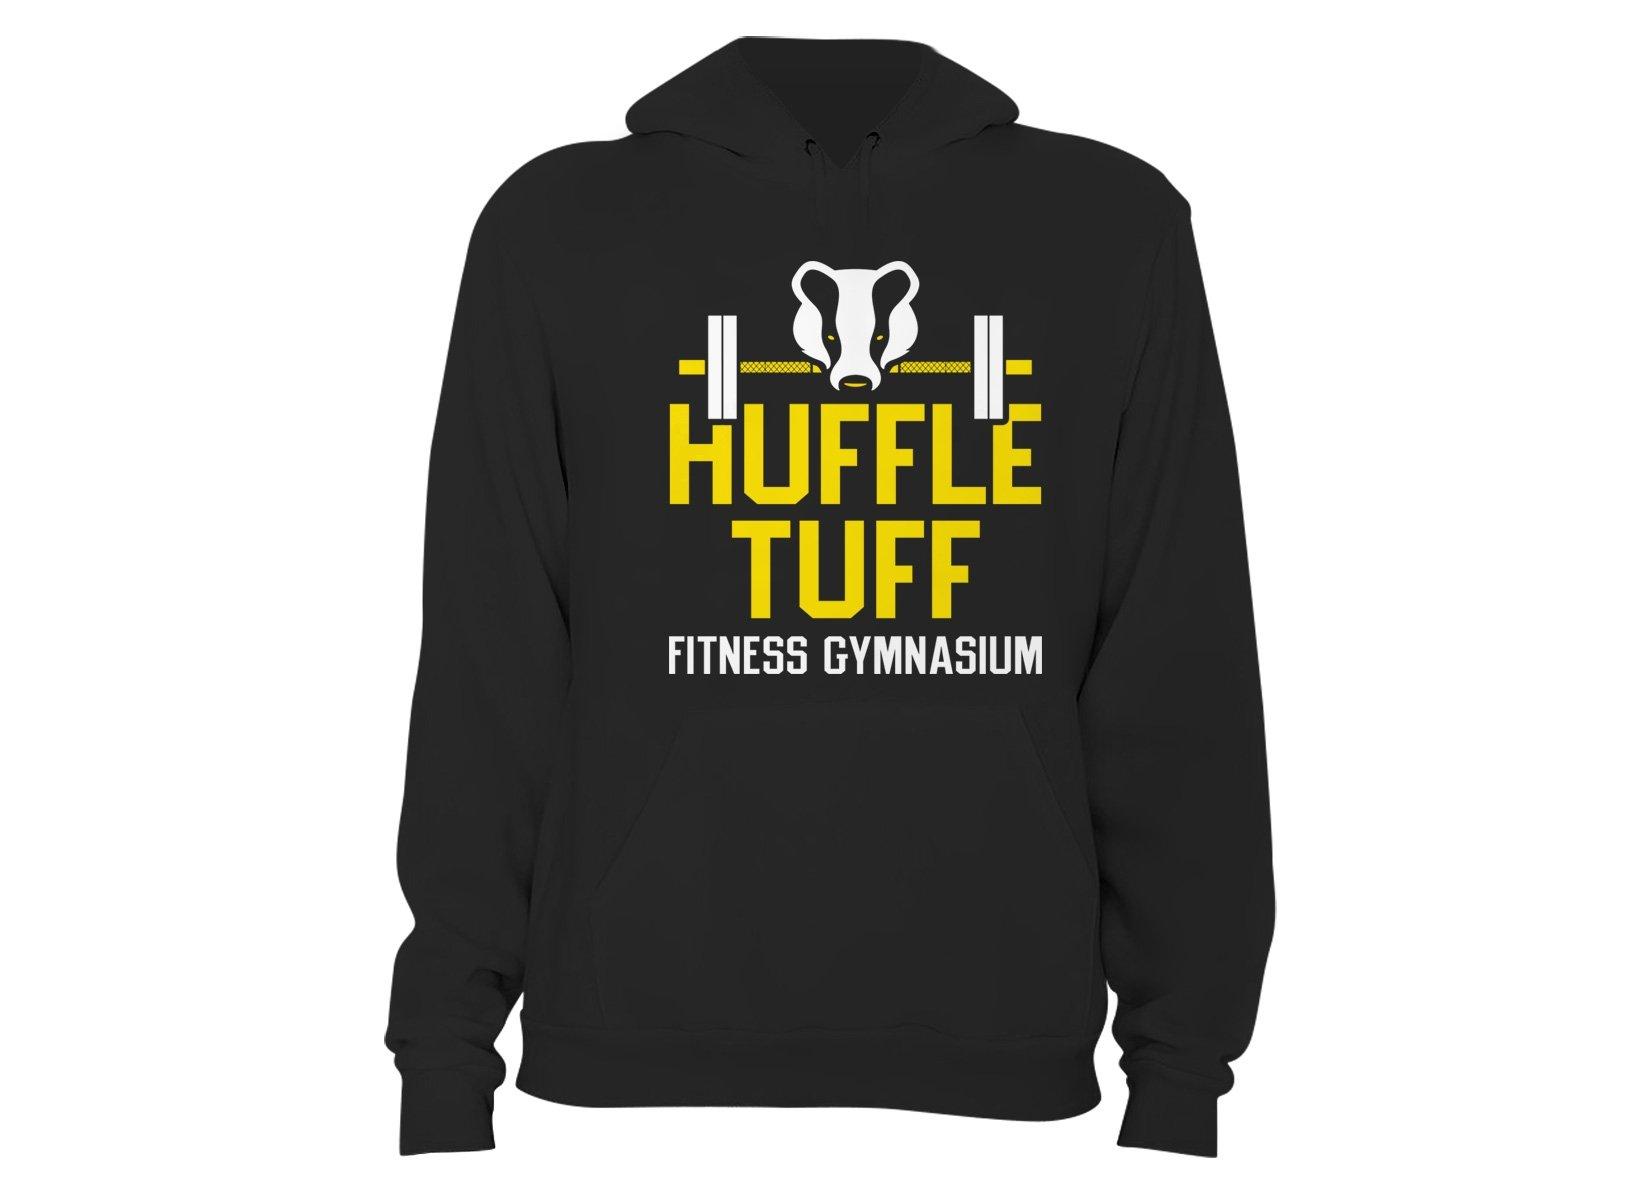 Huffle Tuff Gym on Hoodie